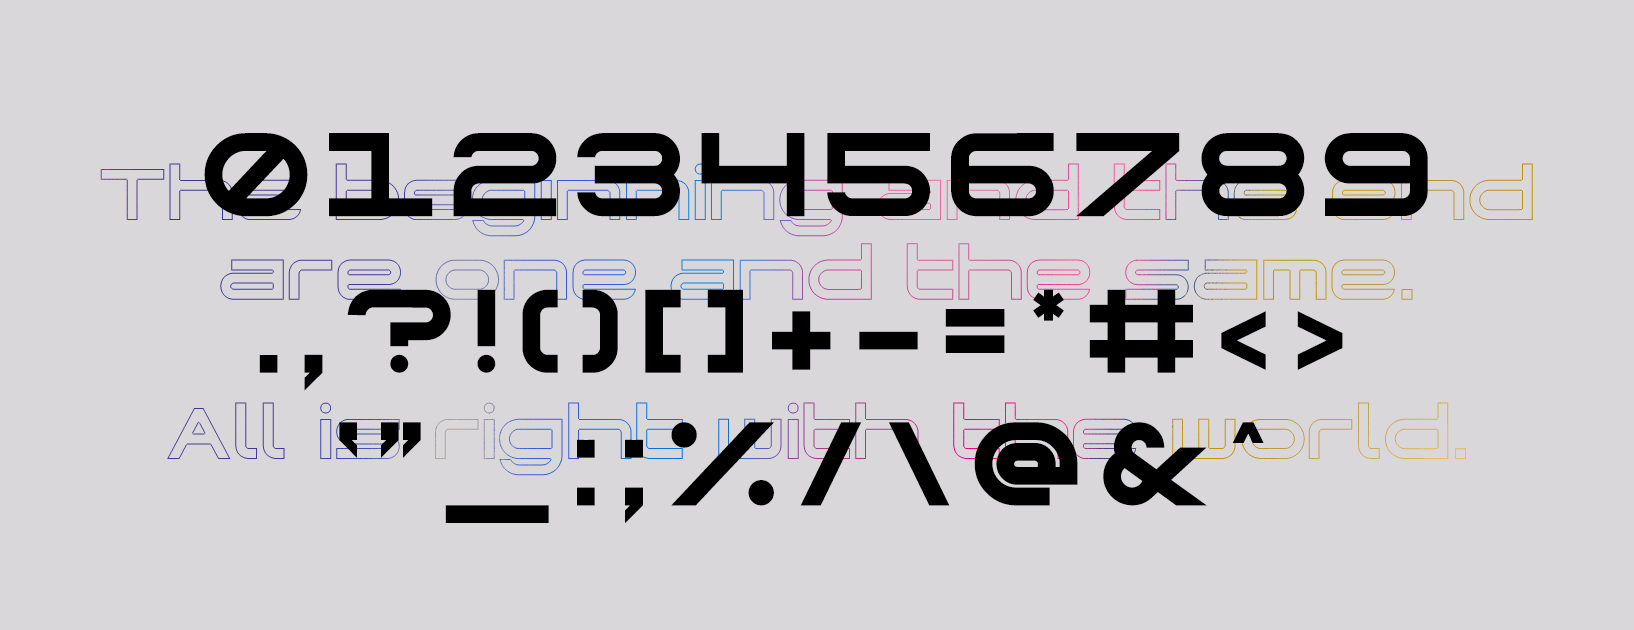 Genesys Bold Display Font -3